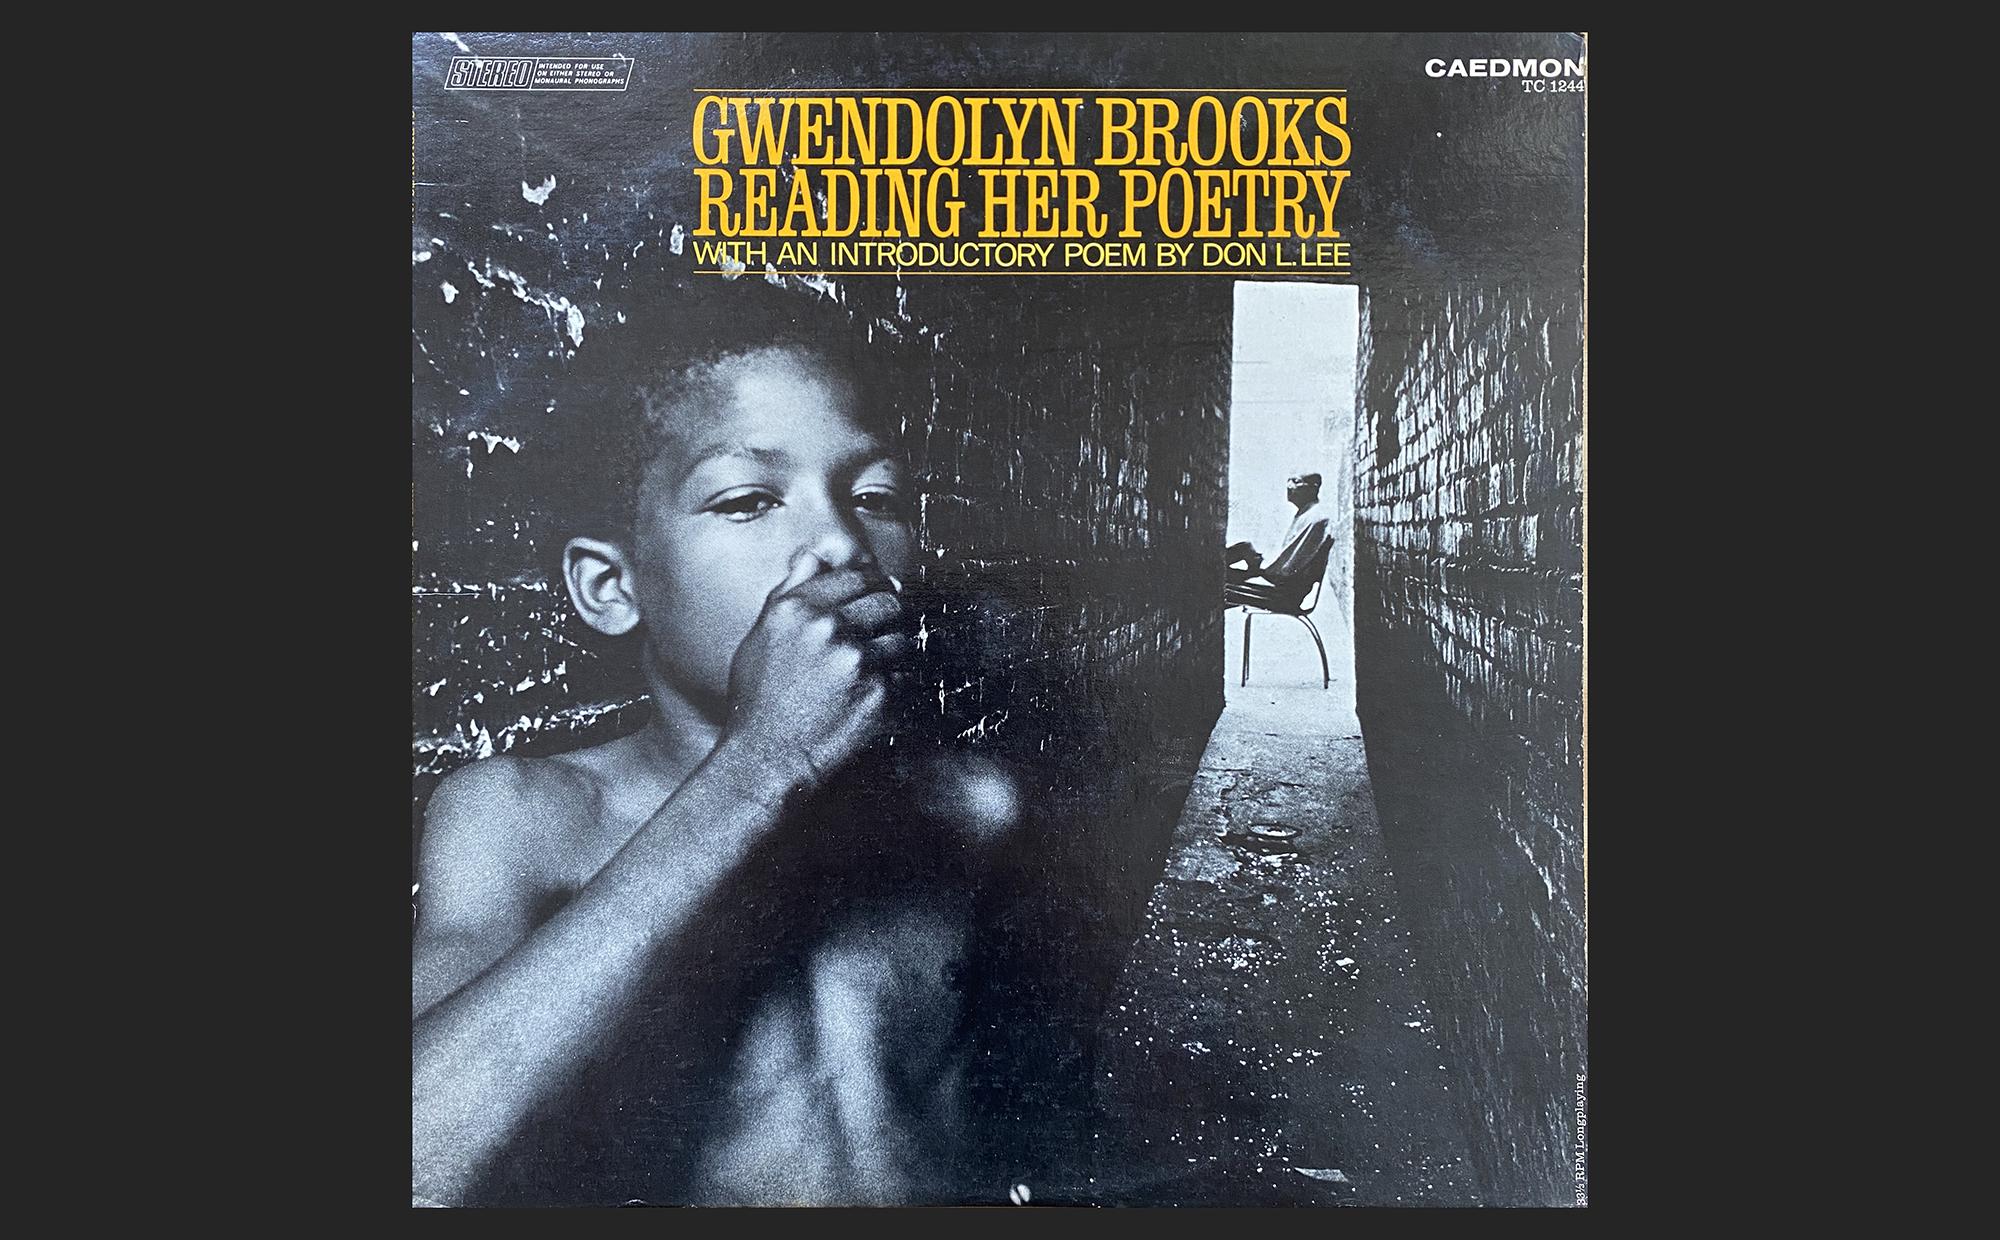 Gwendolyn Brooks Reading Her Poetry